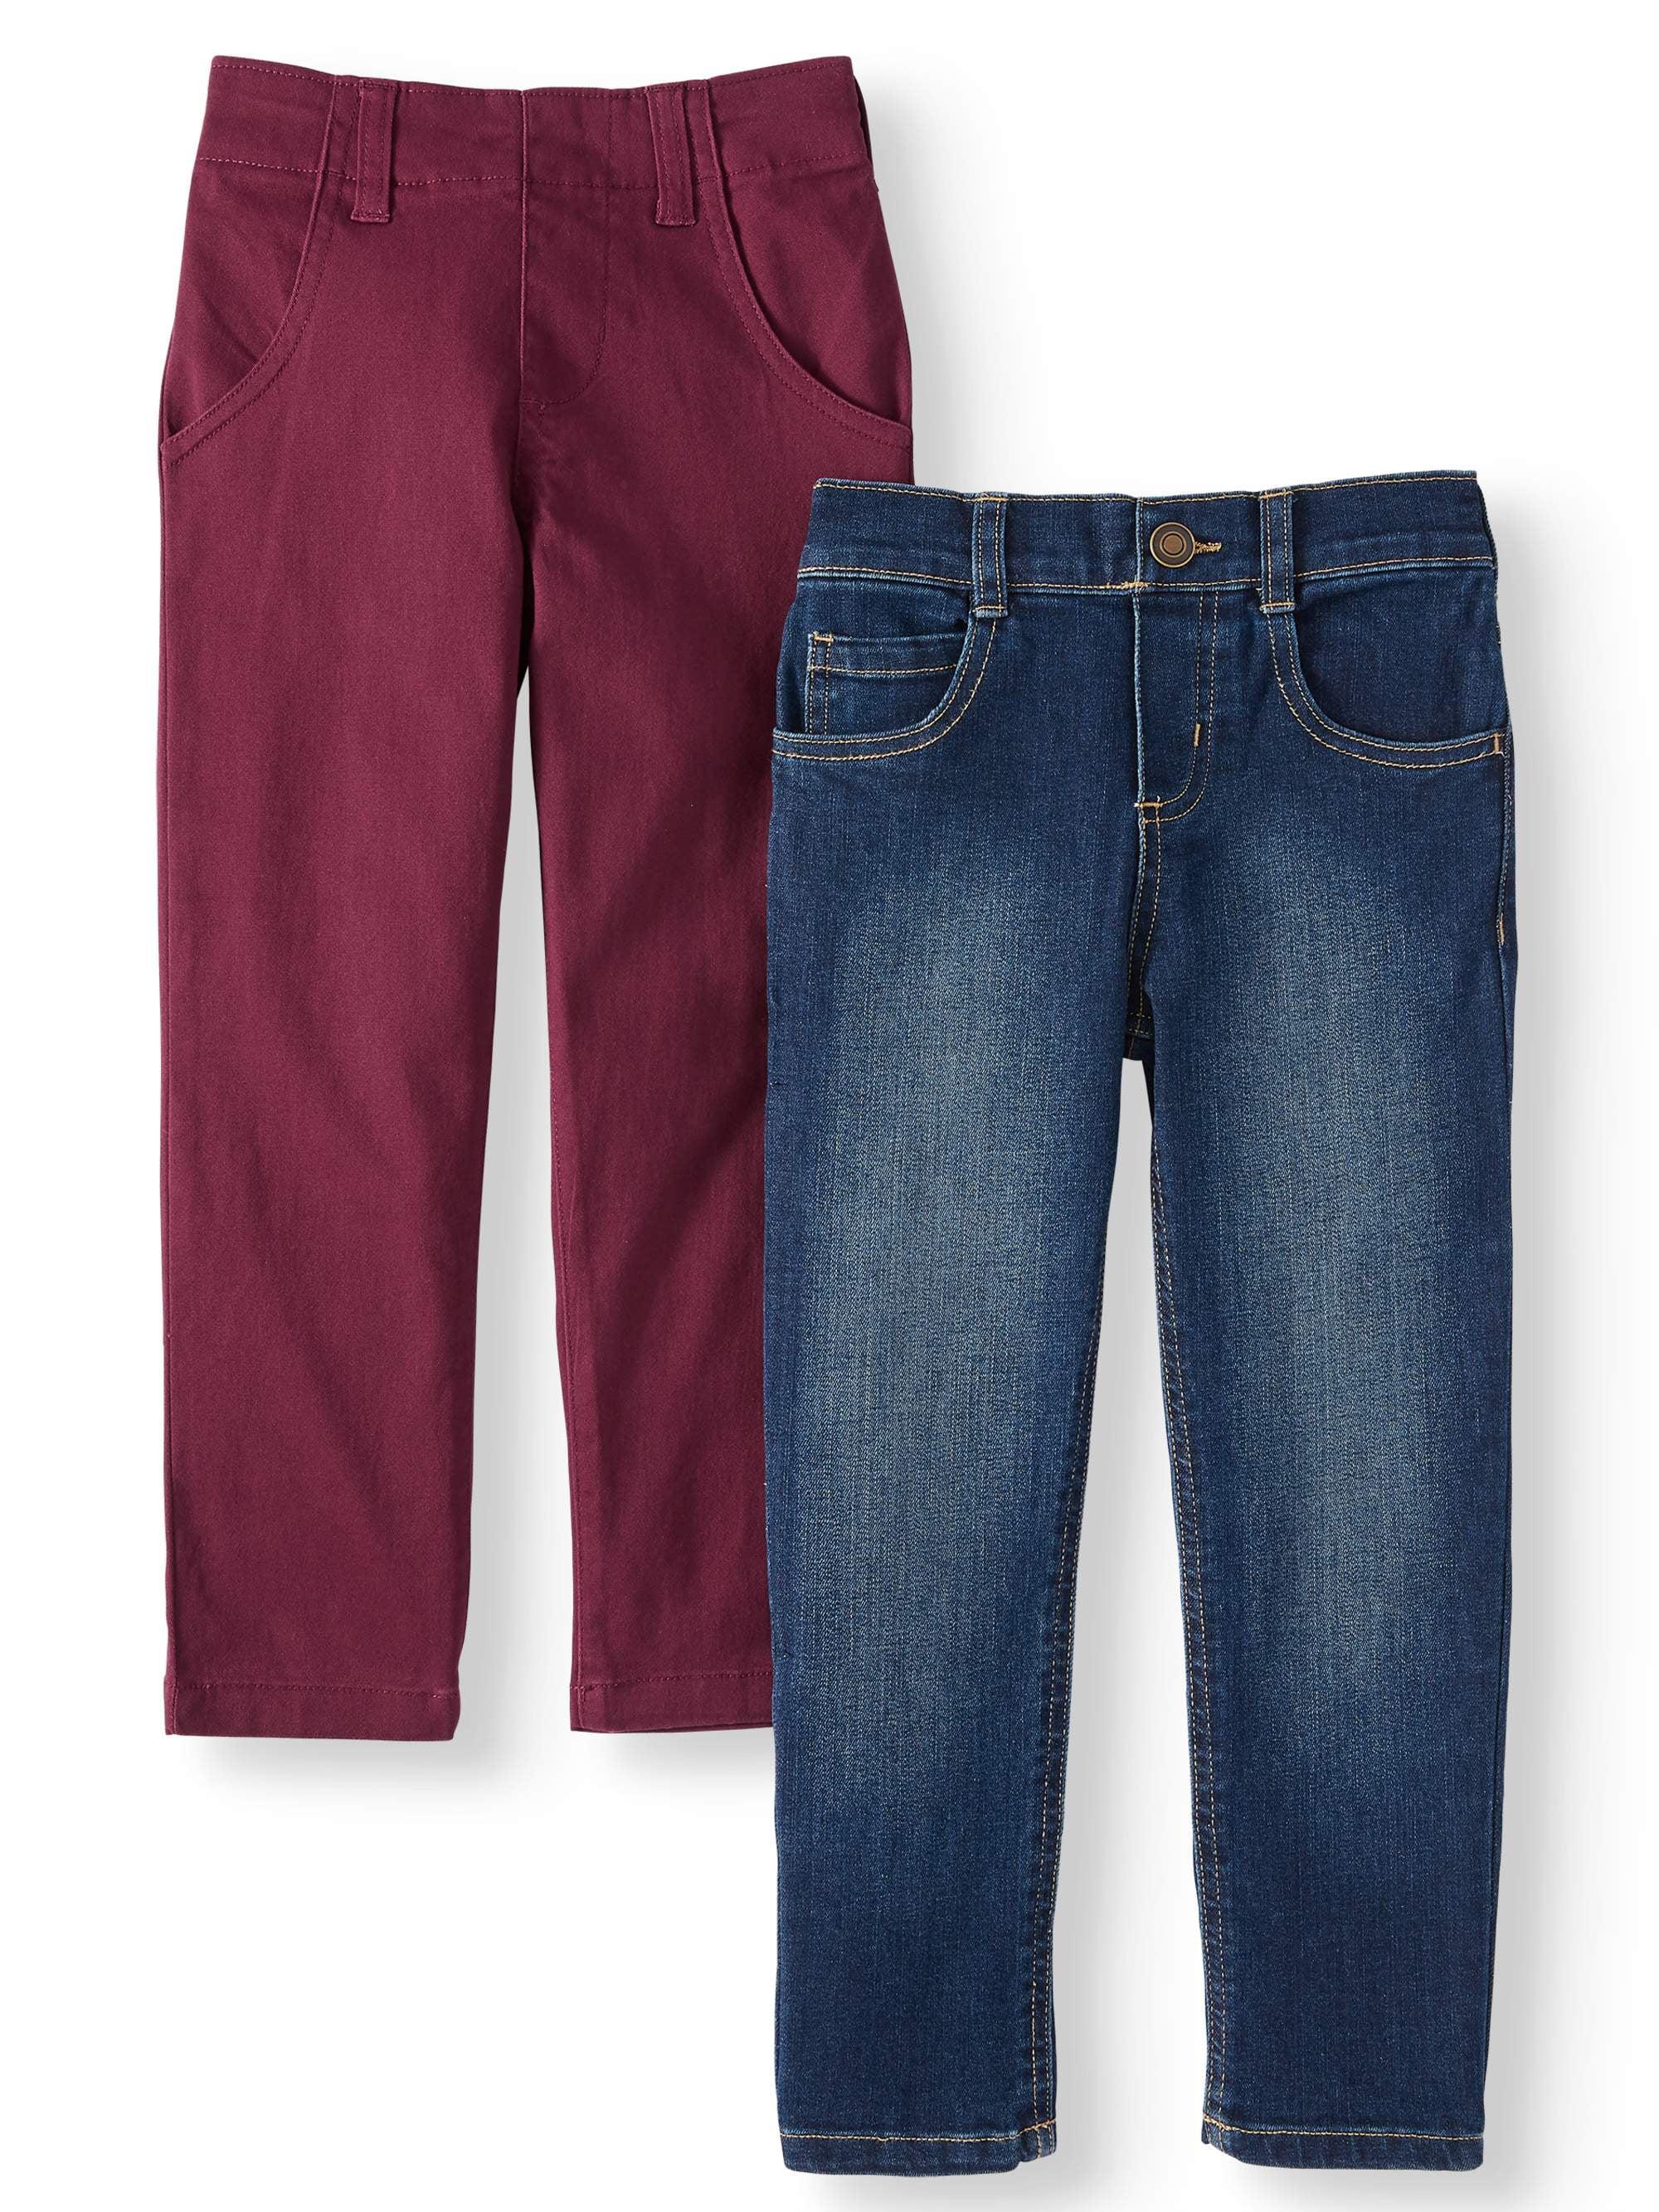 Loose Kids Boys winter Husky Denim boys jeans pants Boys Jeans Toddler Boy Pant 2T-6T